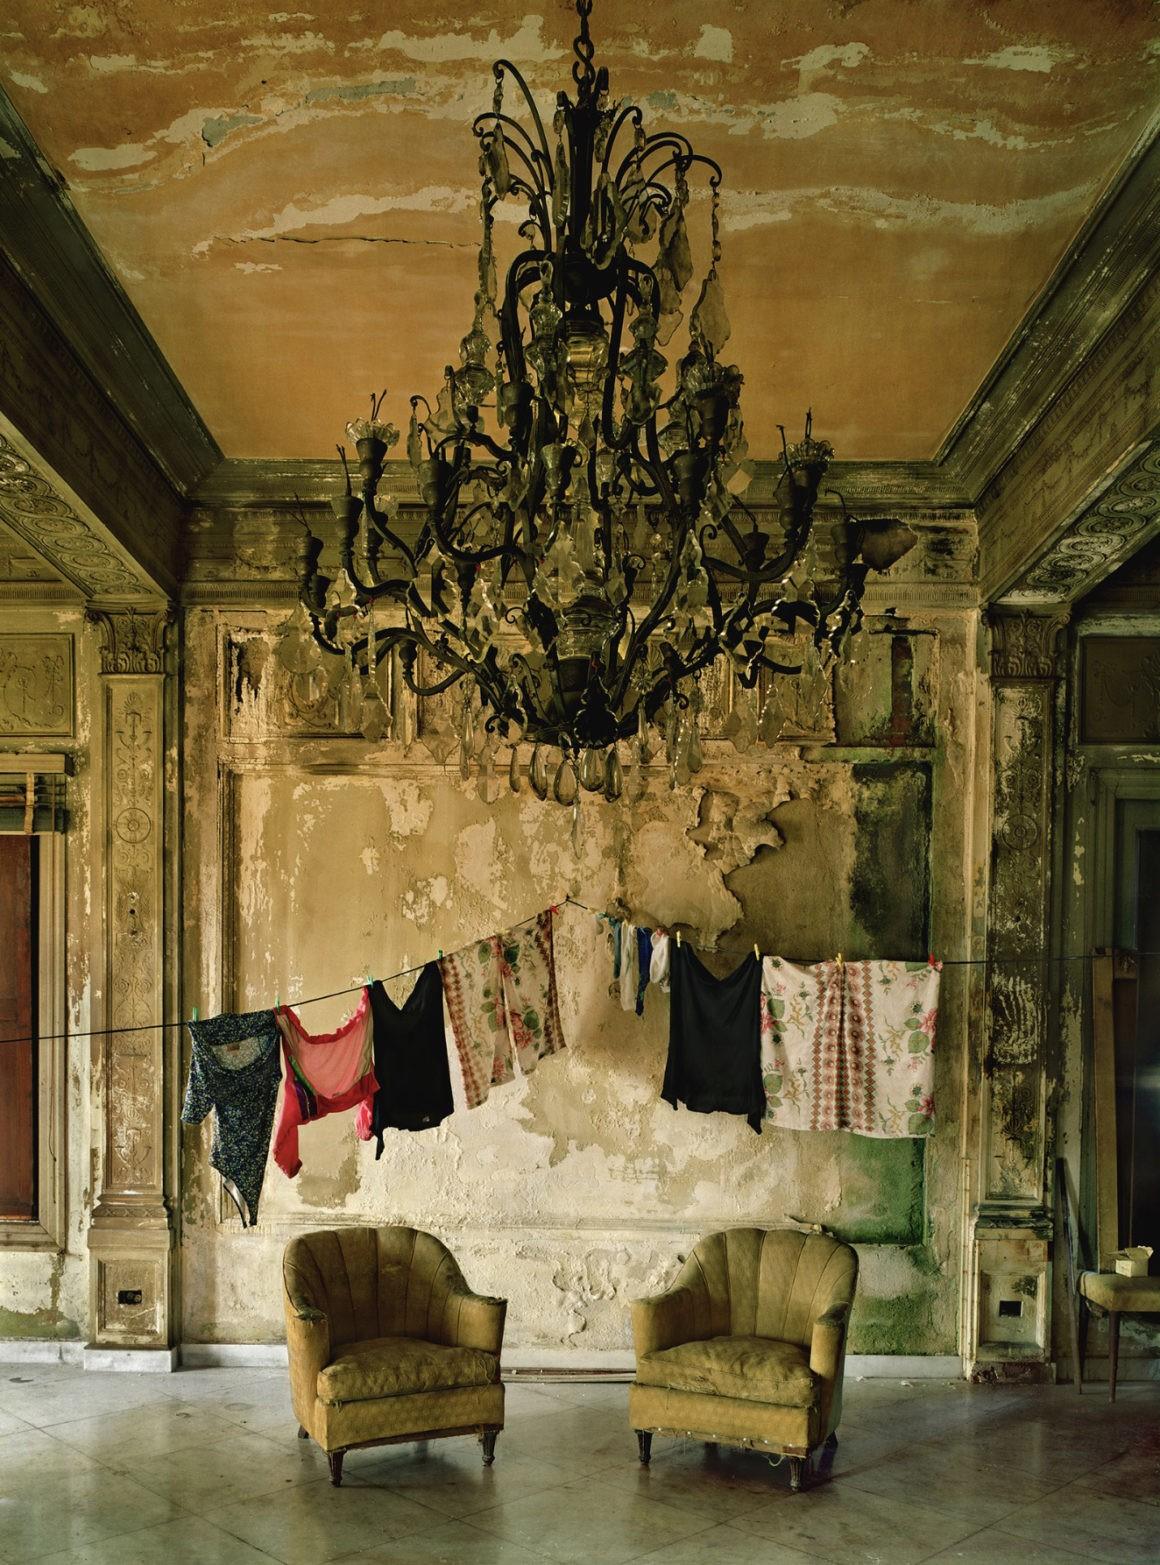 Два стула, Гавана, 2000. Фотограф Майкл Истман